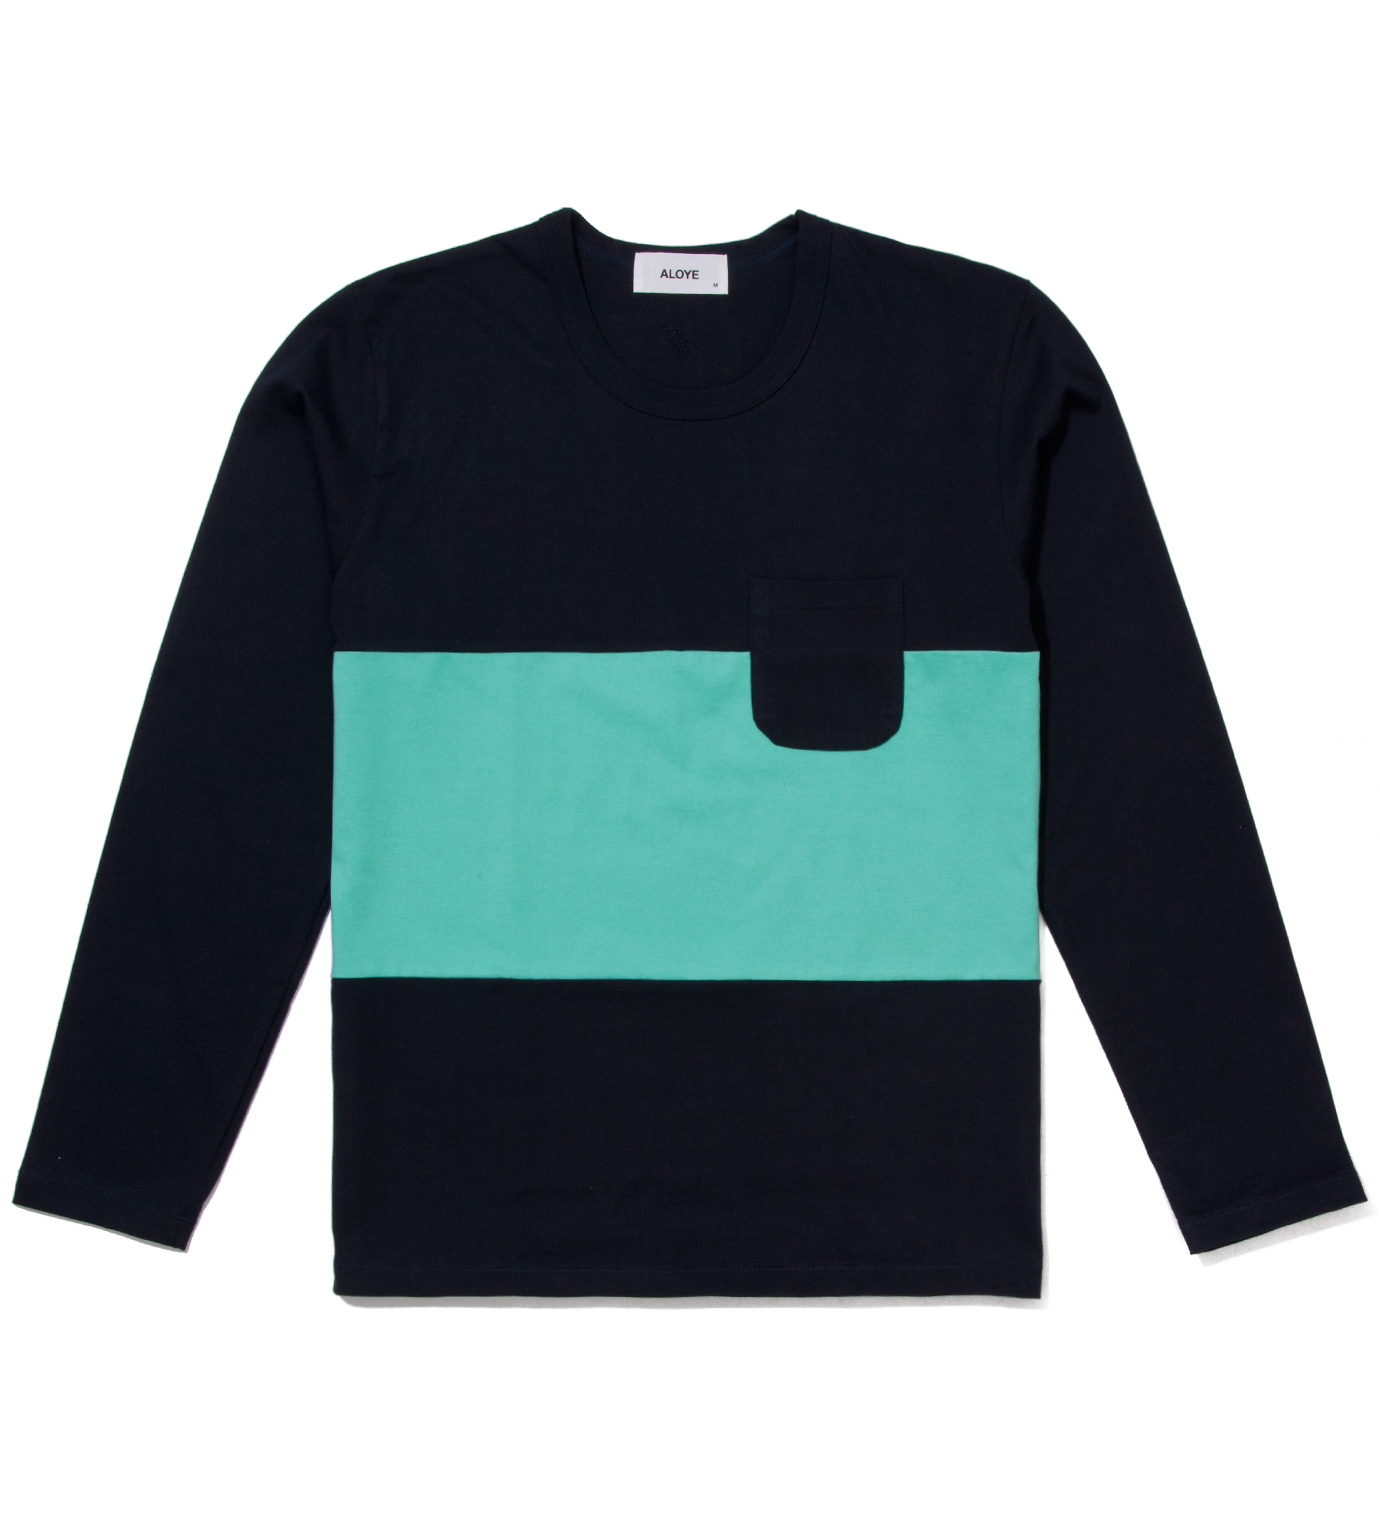 Aloye Tricolor #9 Long Sleeve T-Shirt